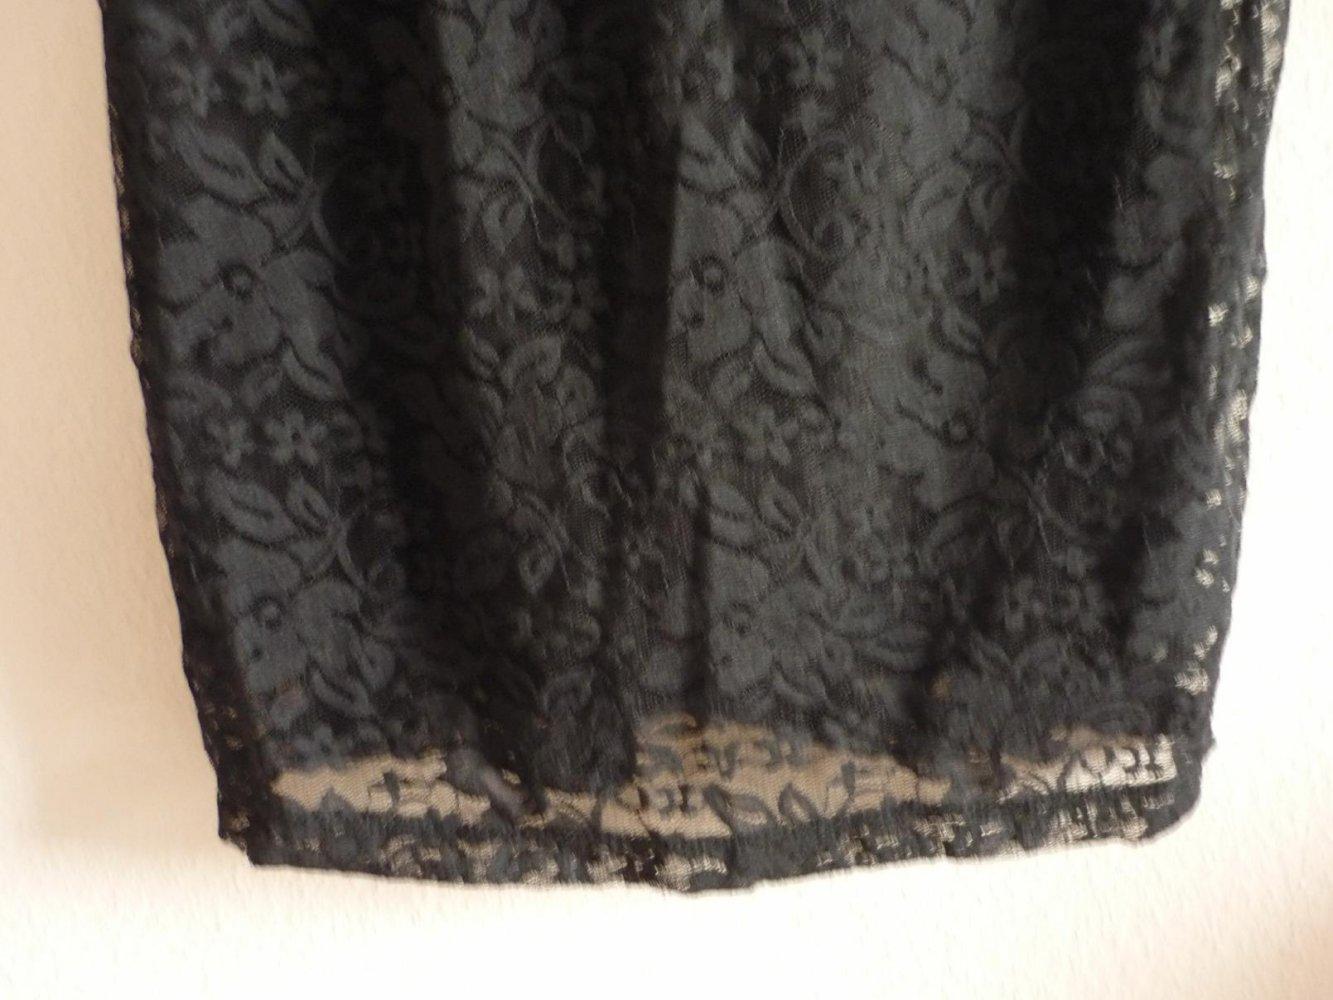 Terranova - Kleid - schwarz - viel Spitze - eng anliegend ...